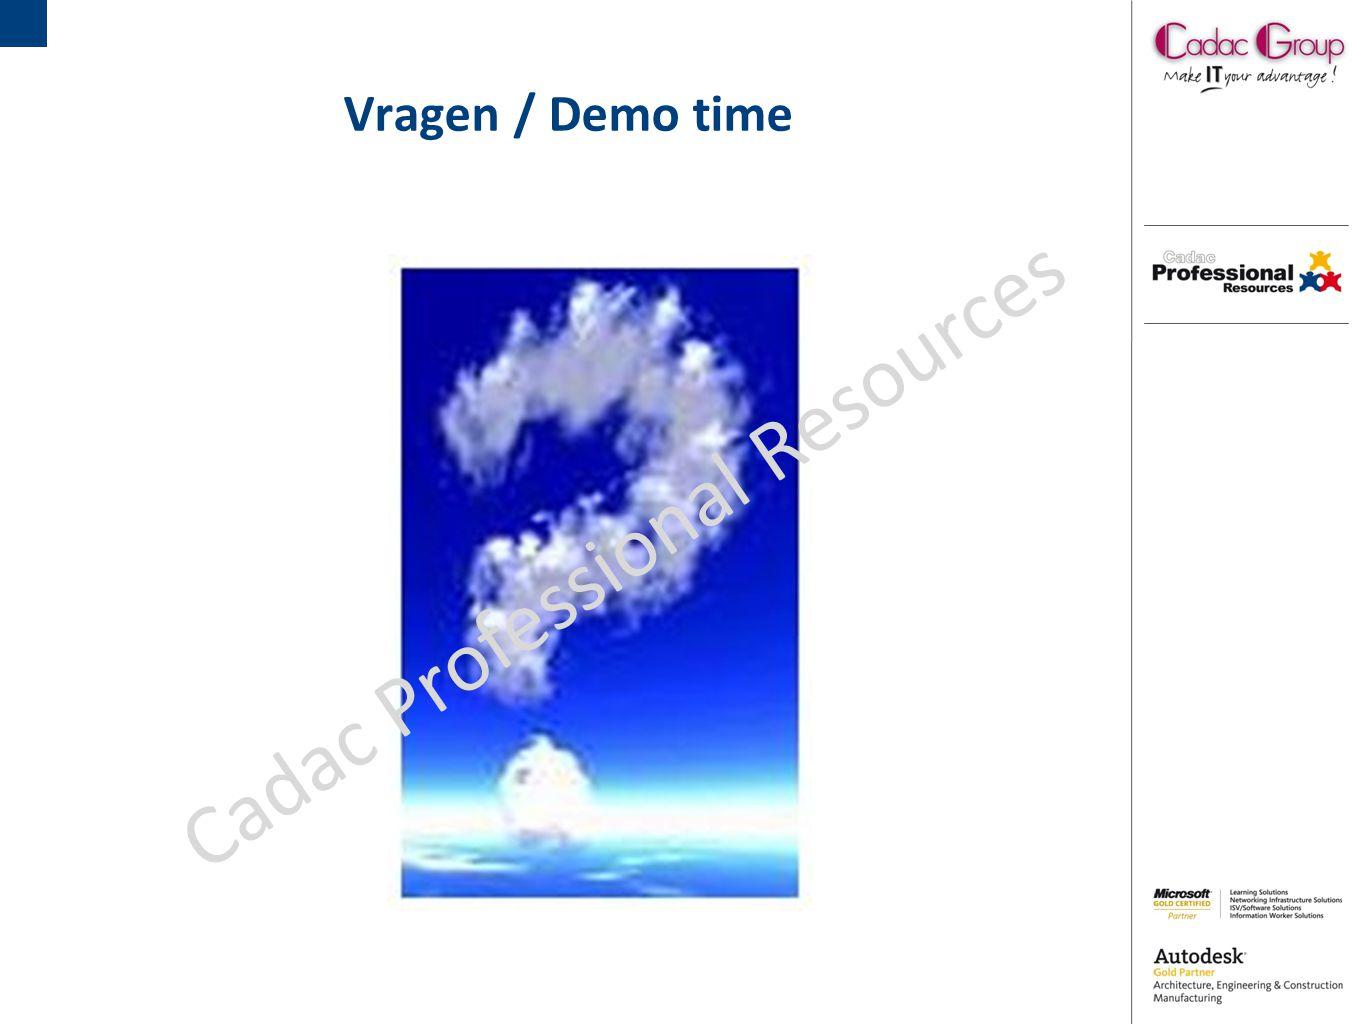 Vragen / Demo time Cadac Professional Resources